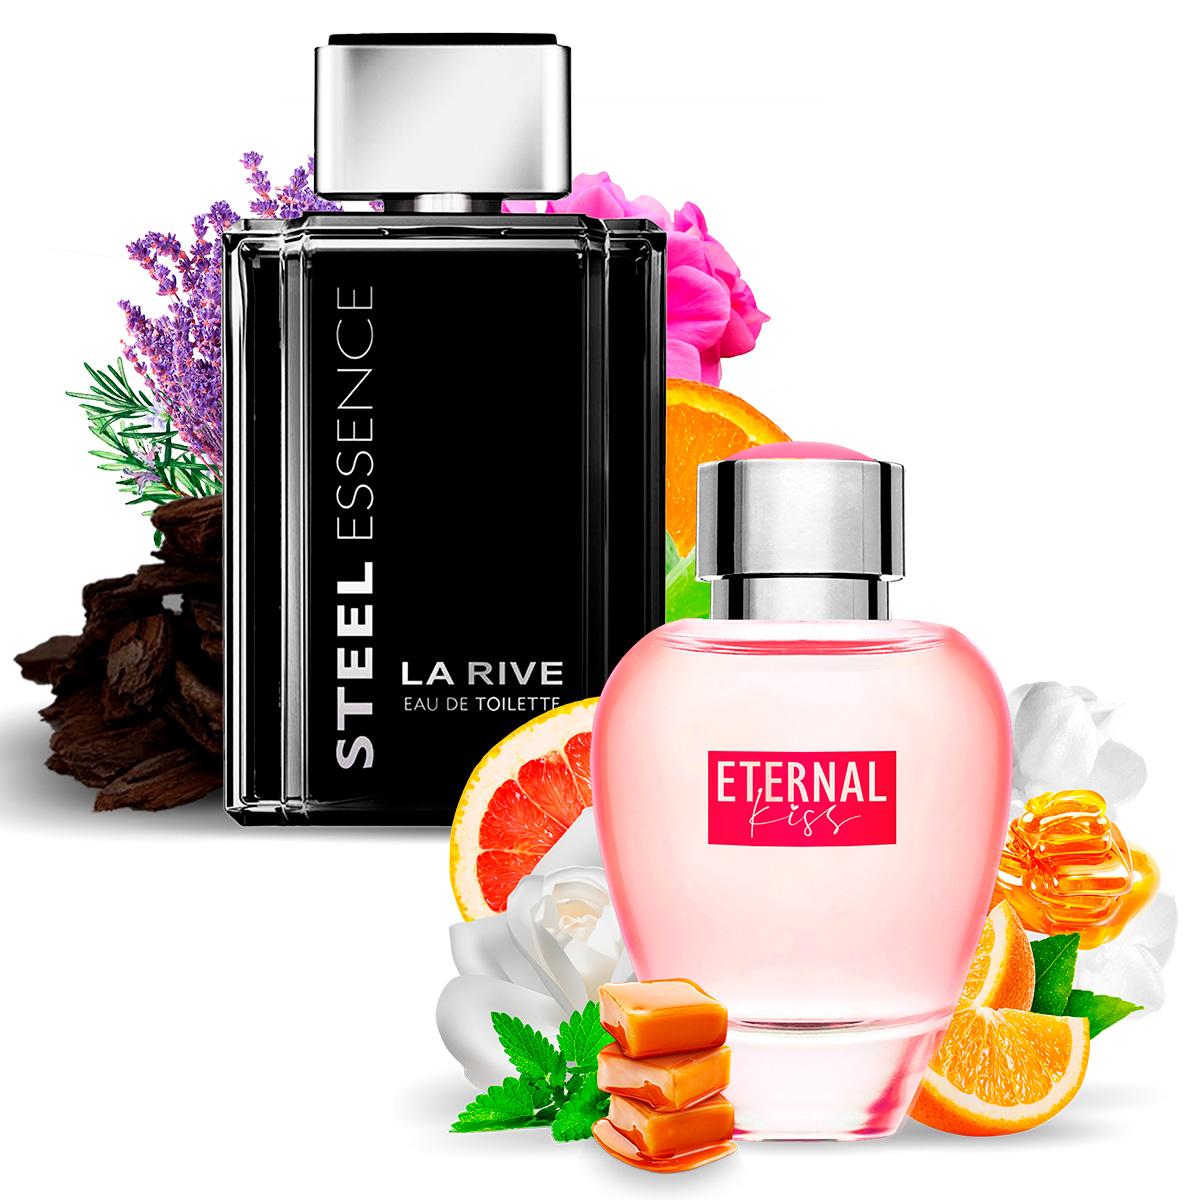 Kit 2 Perfumes, Steel Essence e Eternal Kiss La Rive